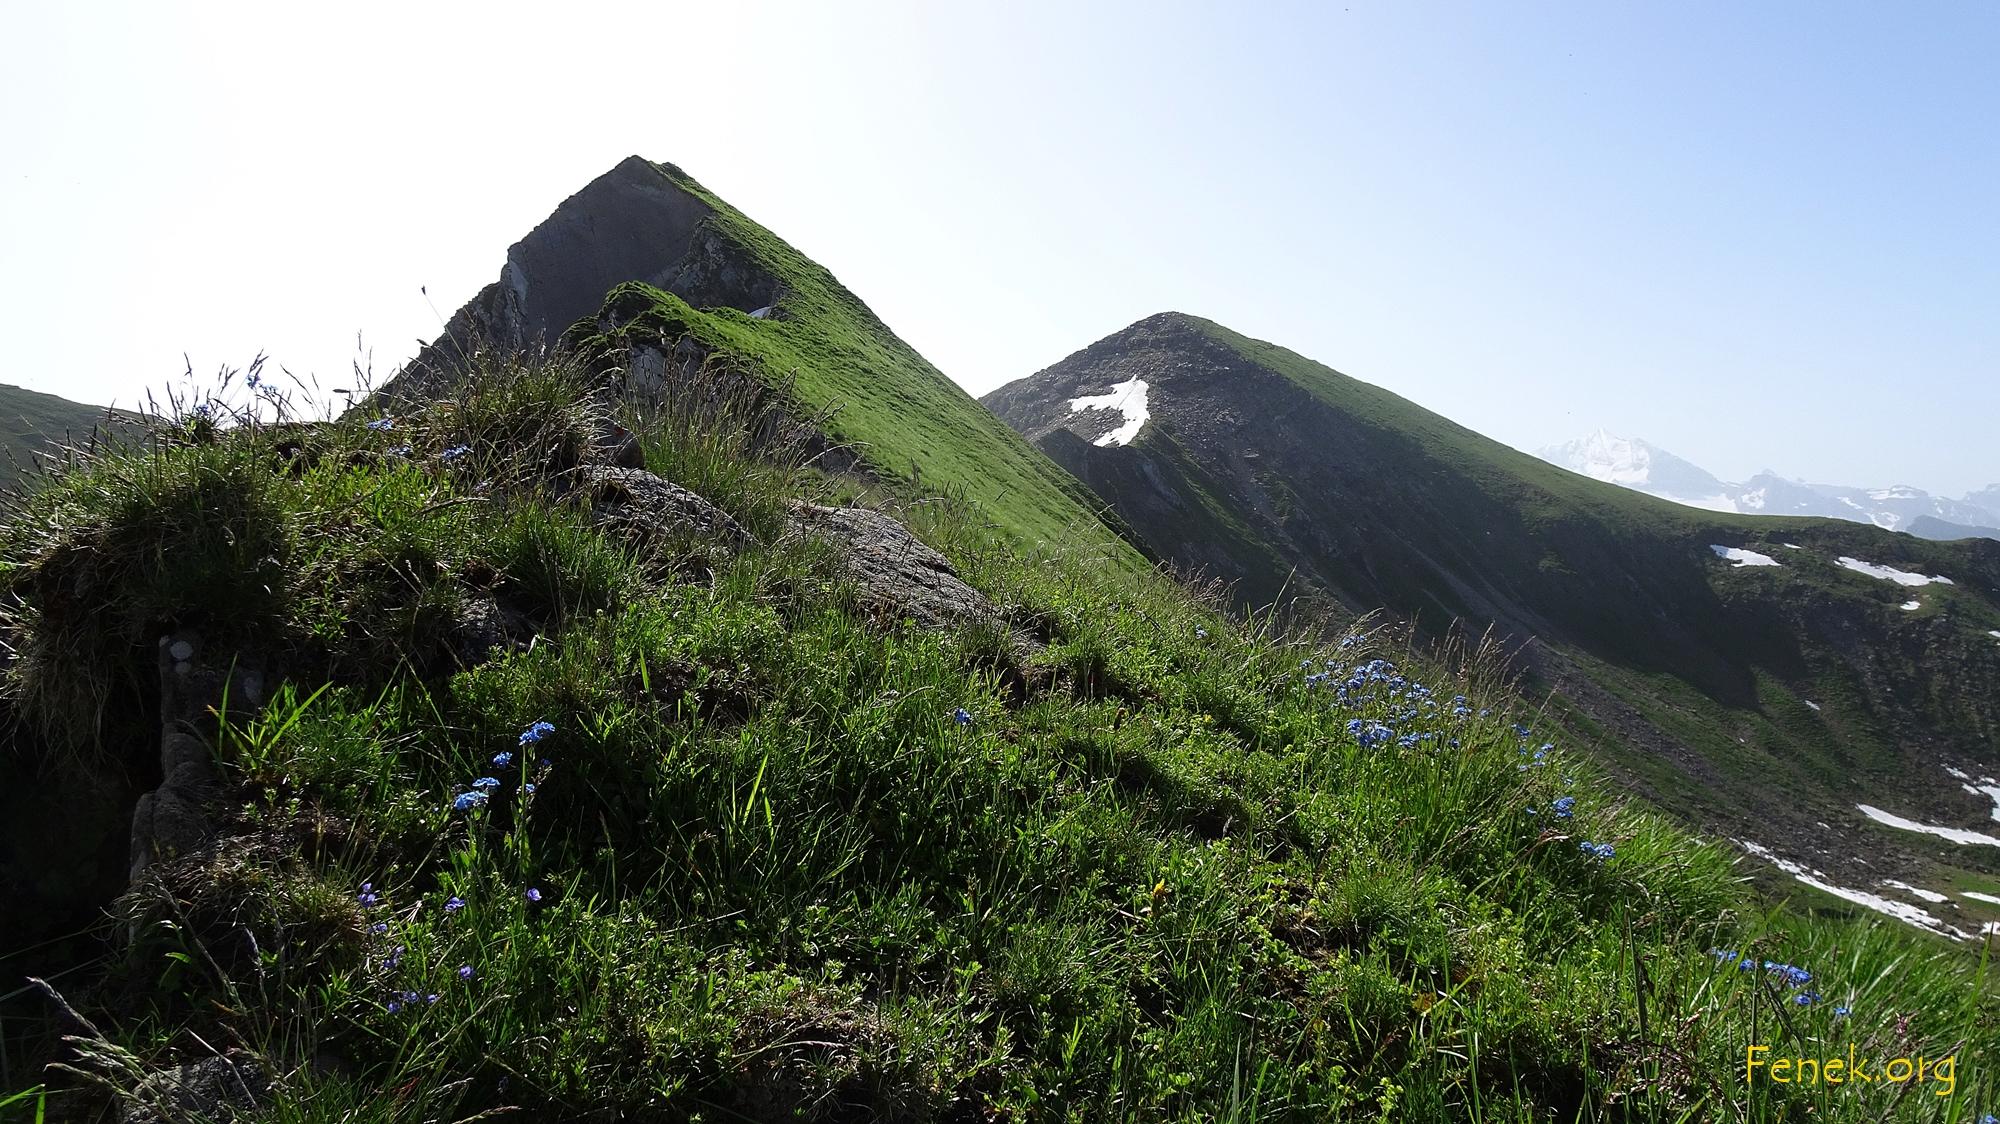 links der Gipfel - rechts Mäggisserehore